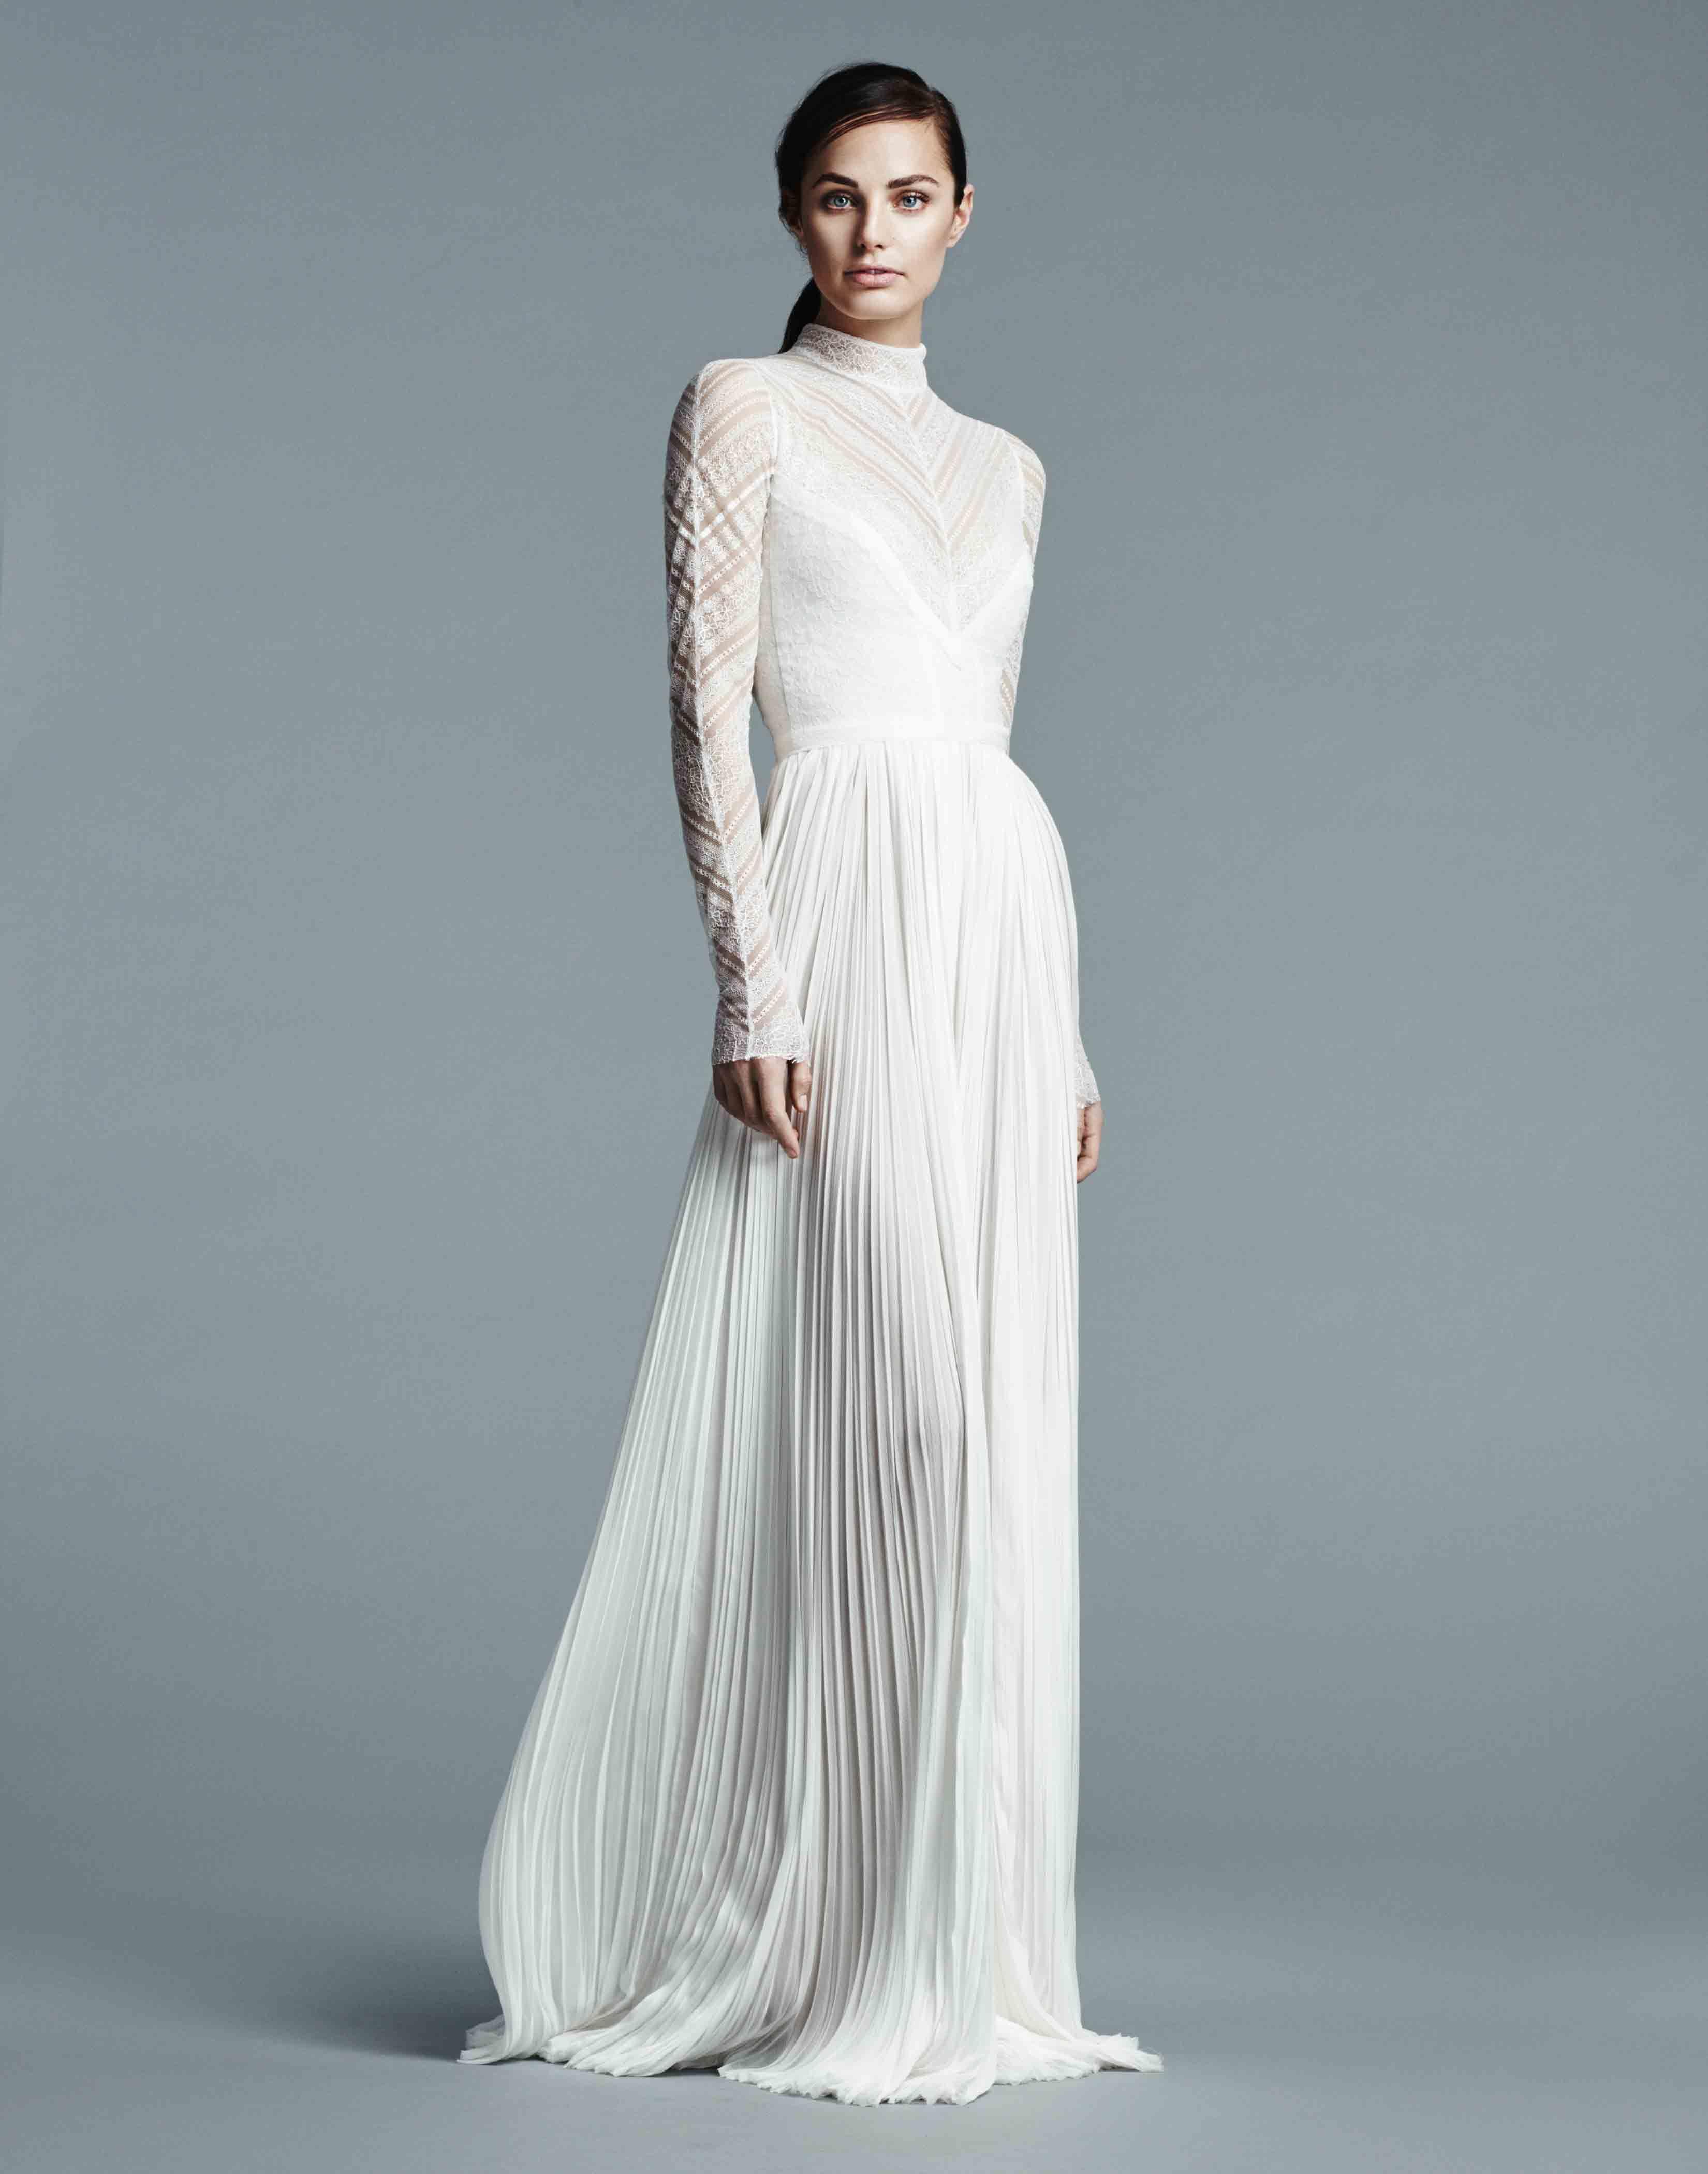 23 Winter Wedding Dresses that WOW | Wedding dress, Weddings and Wedding